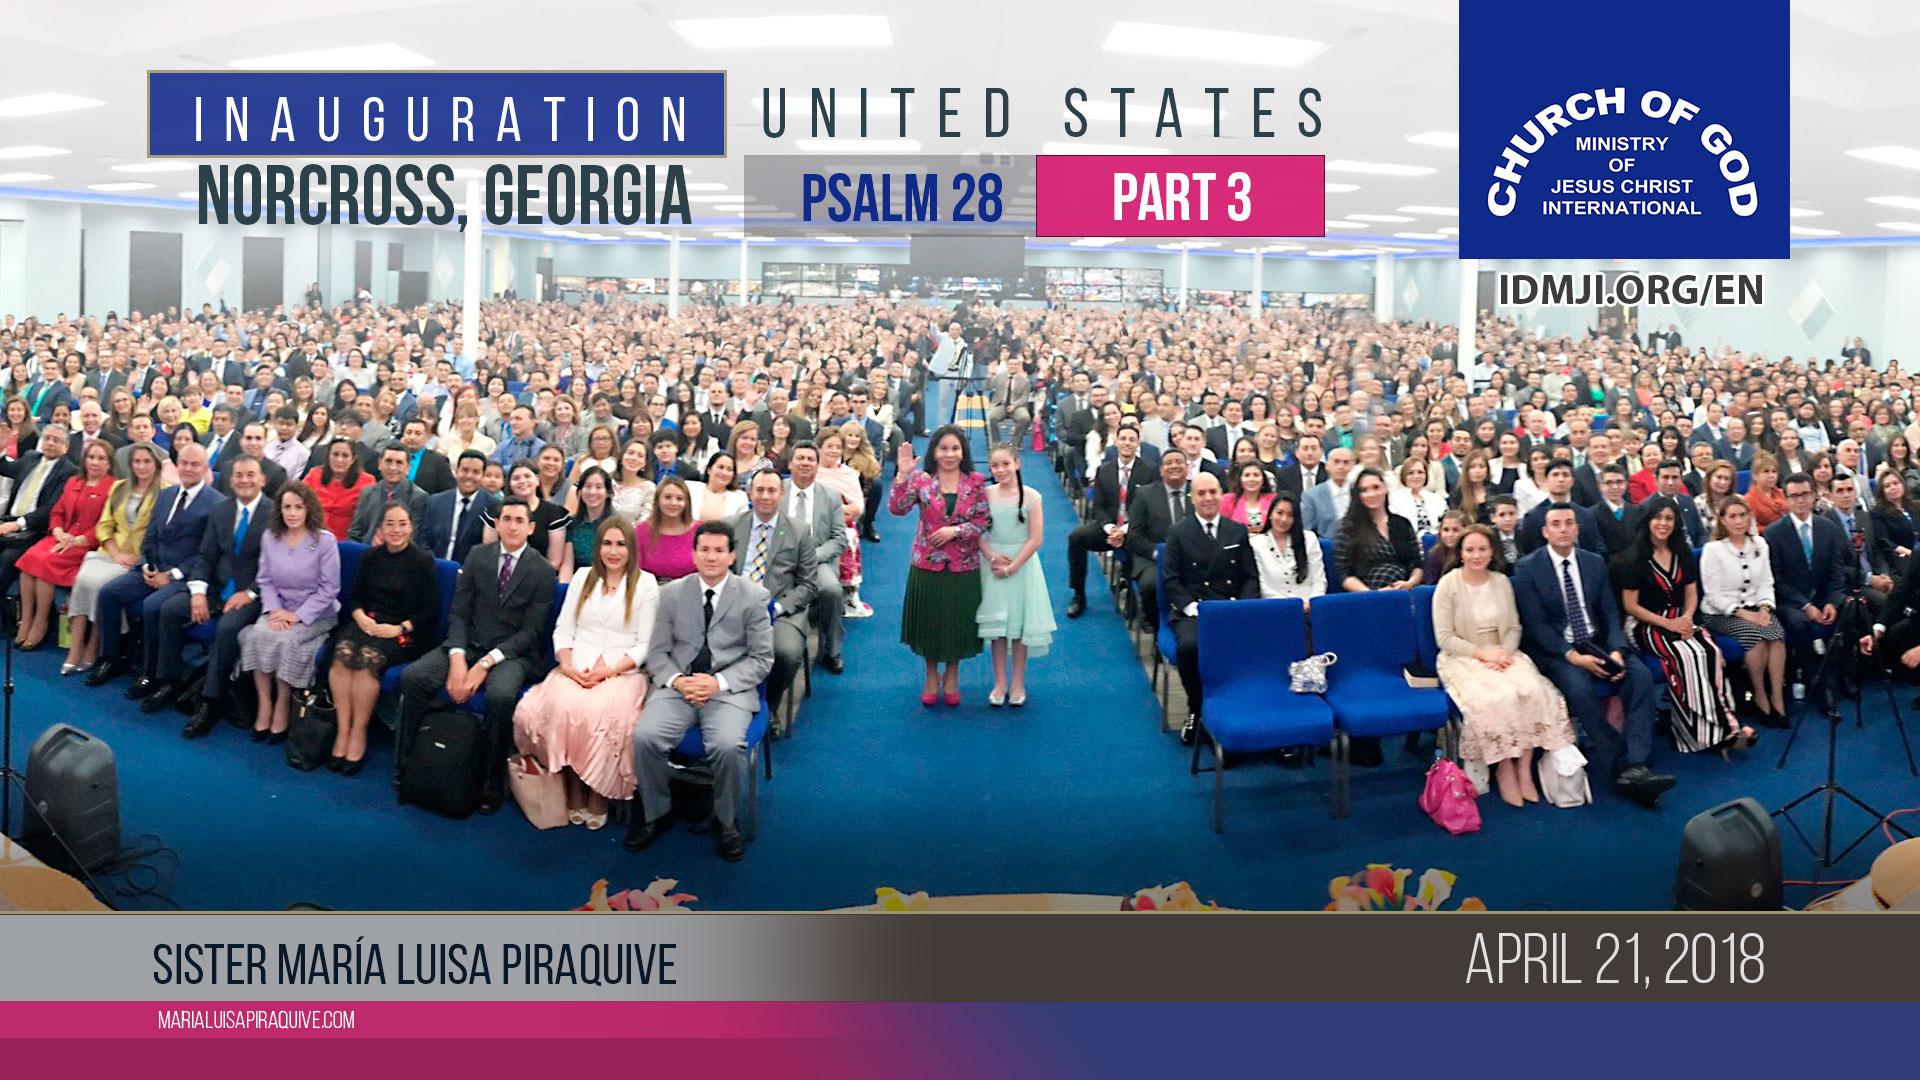 Inauguration Norcross, Georgia, United States (Part 3)